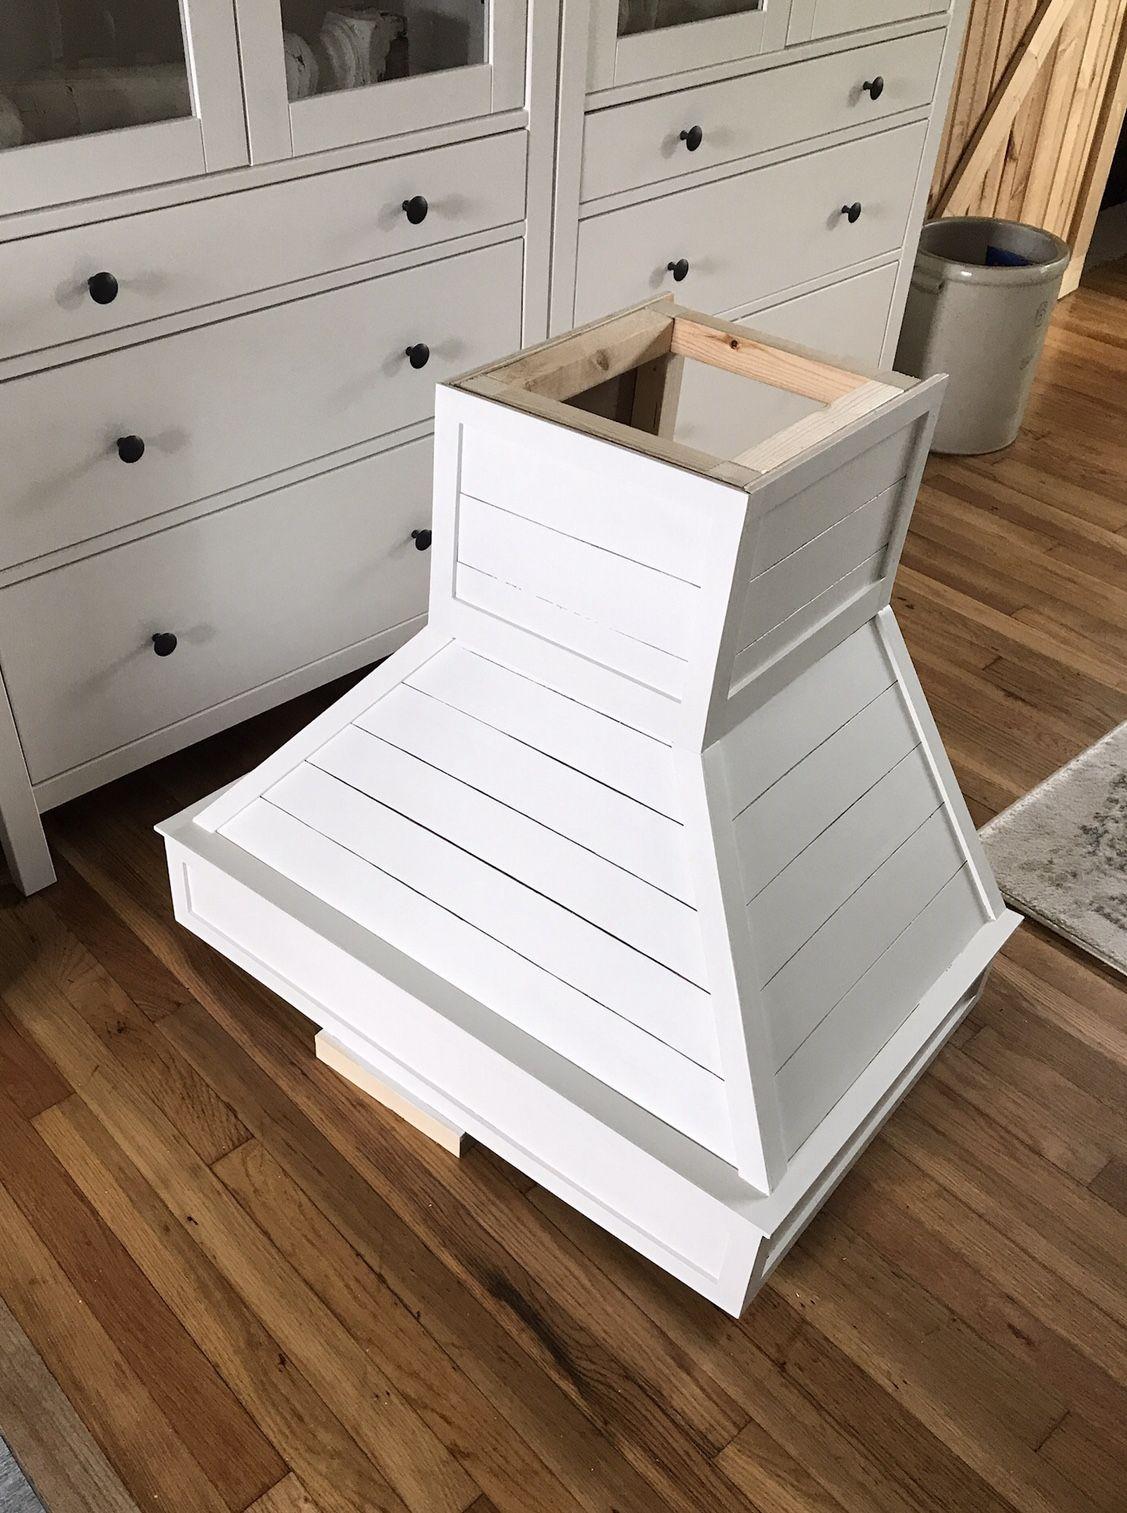 DIY Wood Shiplap Hood Vent Dreaming of Homemaking